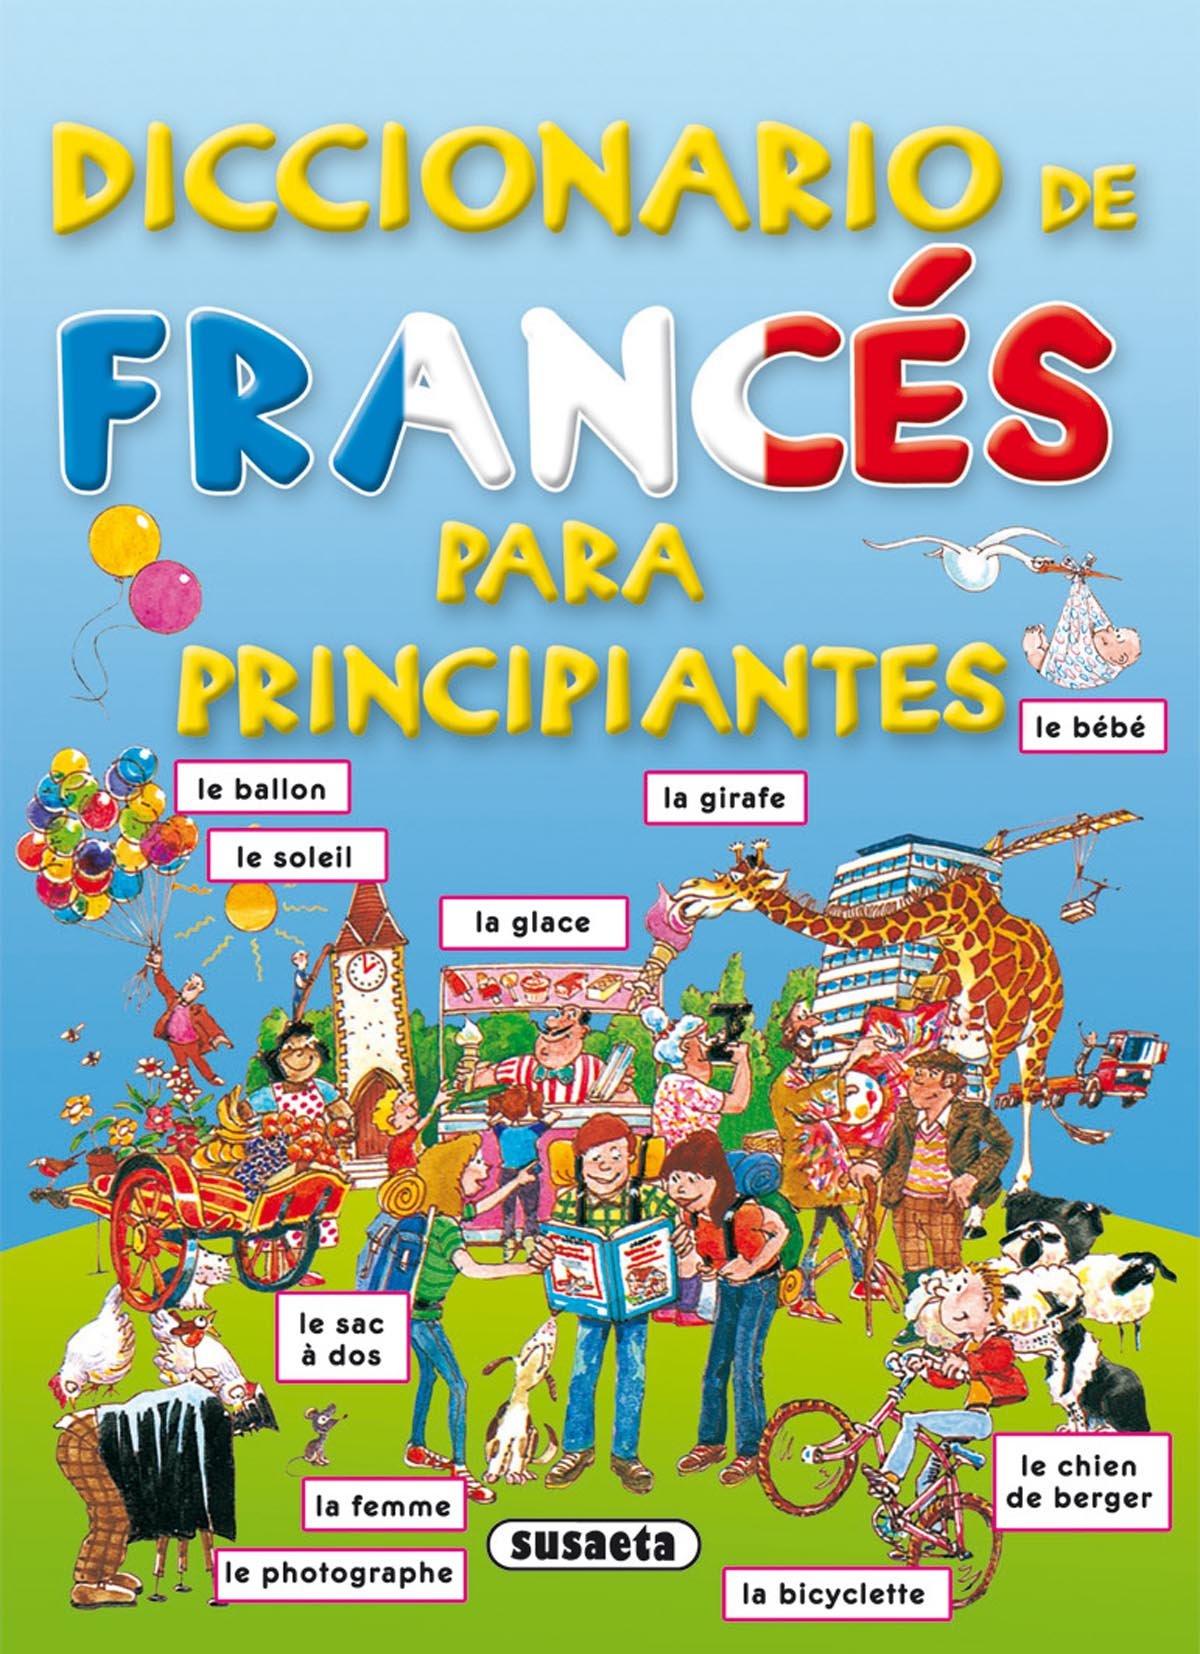 Diccionario De Frances Para Principiantes. (Diccionario Para Principiantes) Tapa blanda – 15 abr 2008 Equipo Susaeta Tikal-Susaeta 8430563547 Innenarchitektur / Design